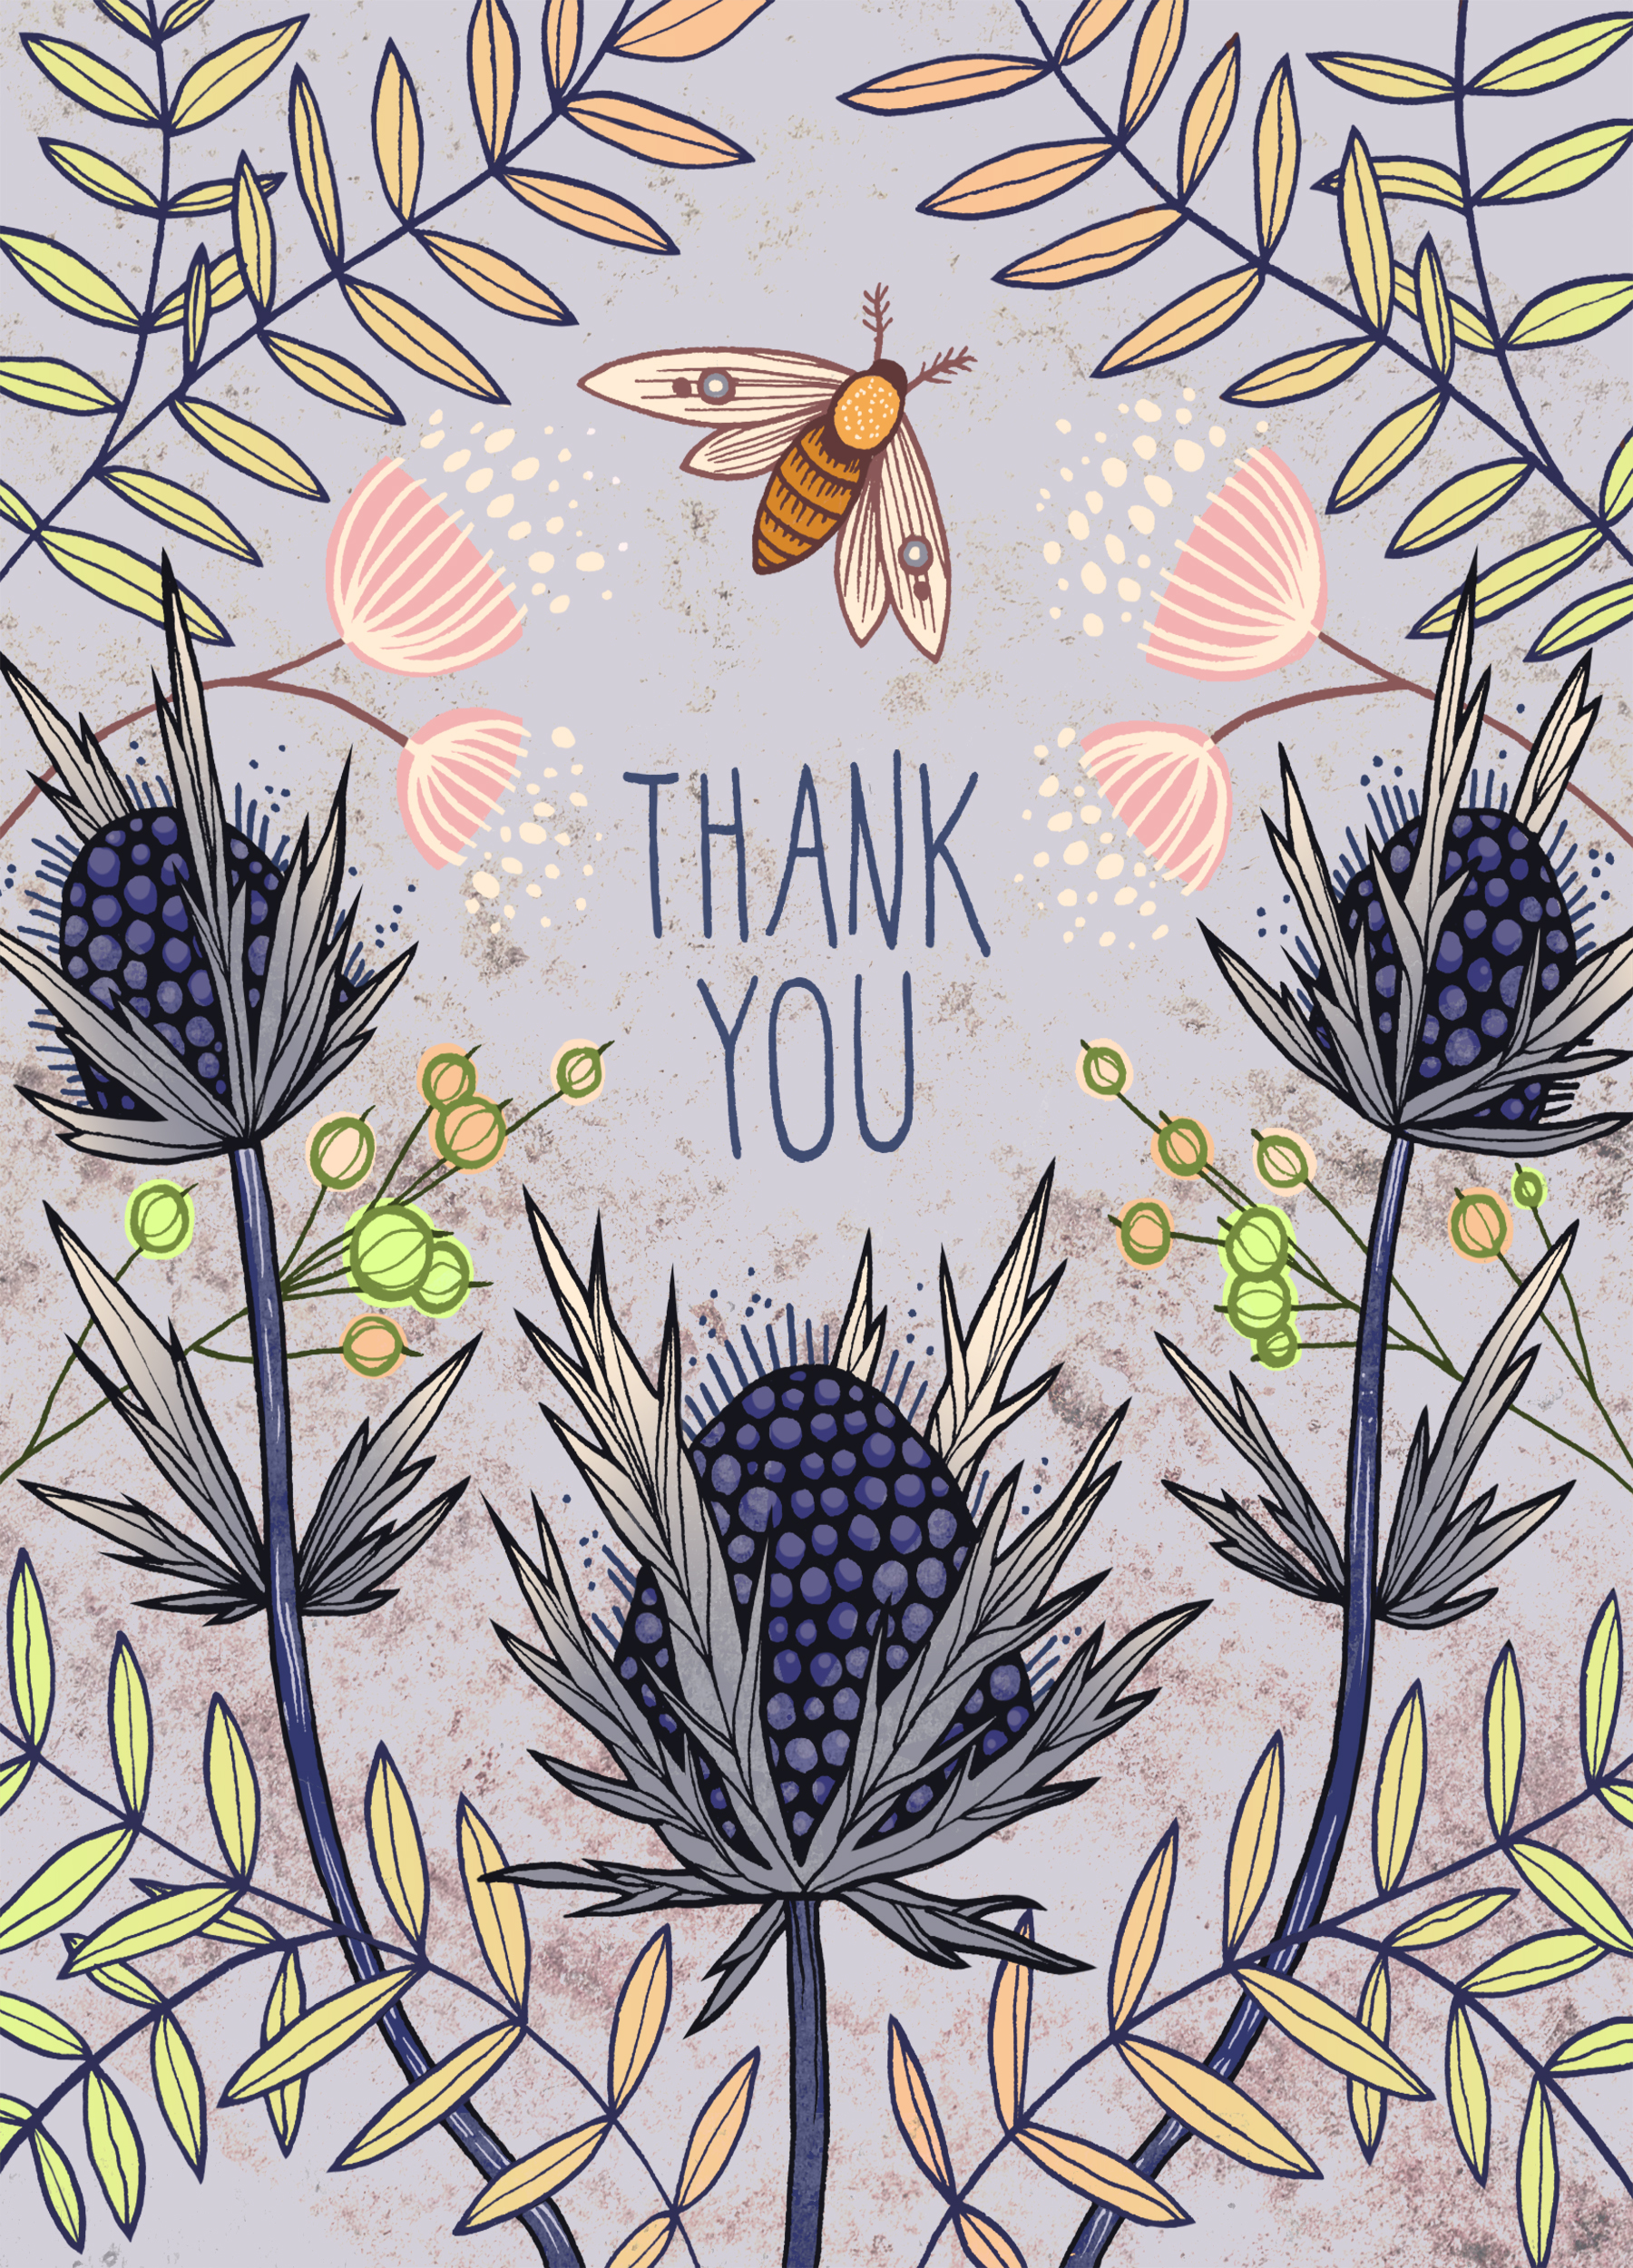 Thank you - Floral 2.jpg